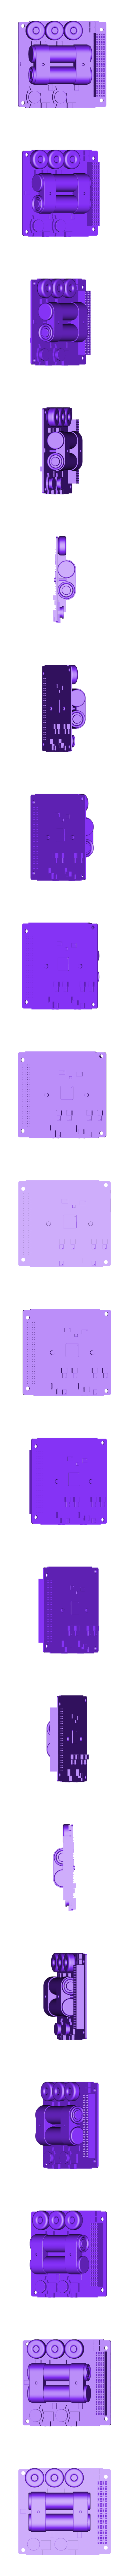 EPS.stl Download free STL file ArduSat • 3D printing template, Loustic3D888